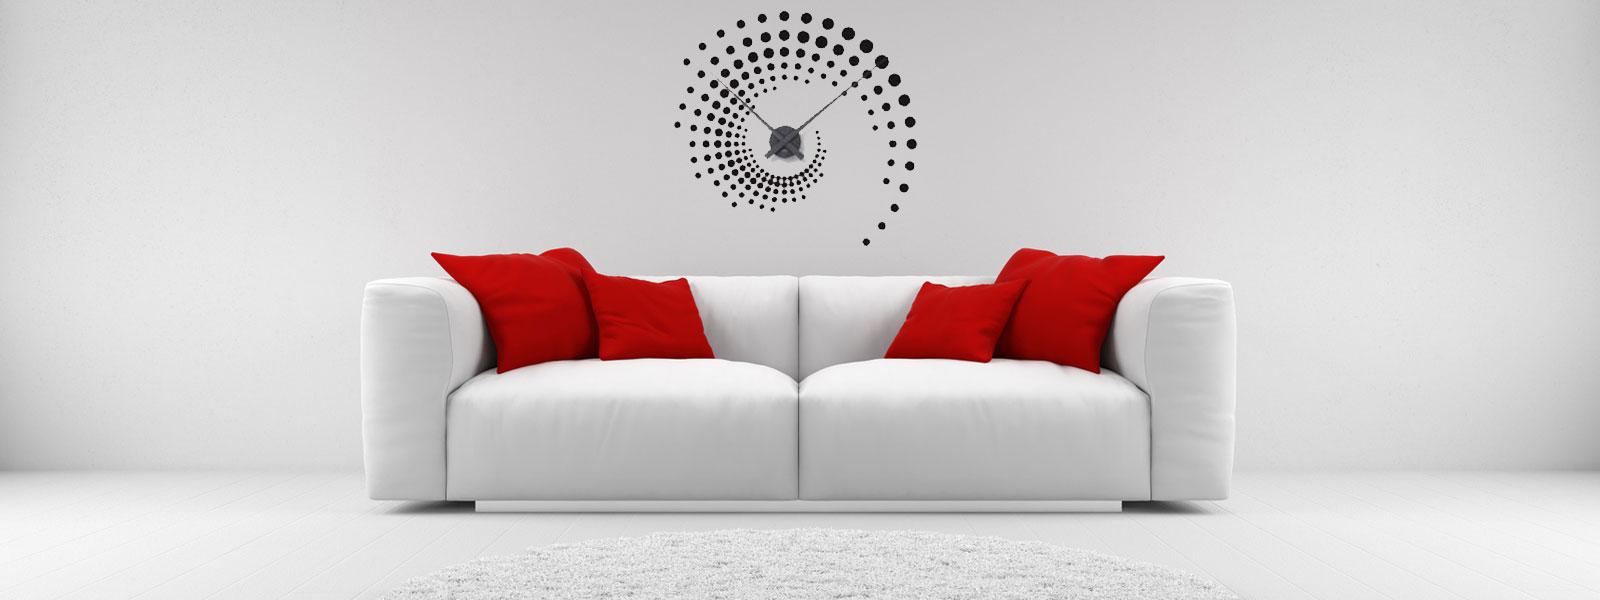 latout dco des stickers muraux et adhsifs dcoratifs sohomefr - Decoration Stickers Muraux Adhesif